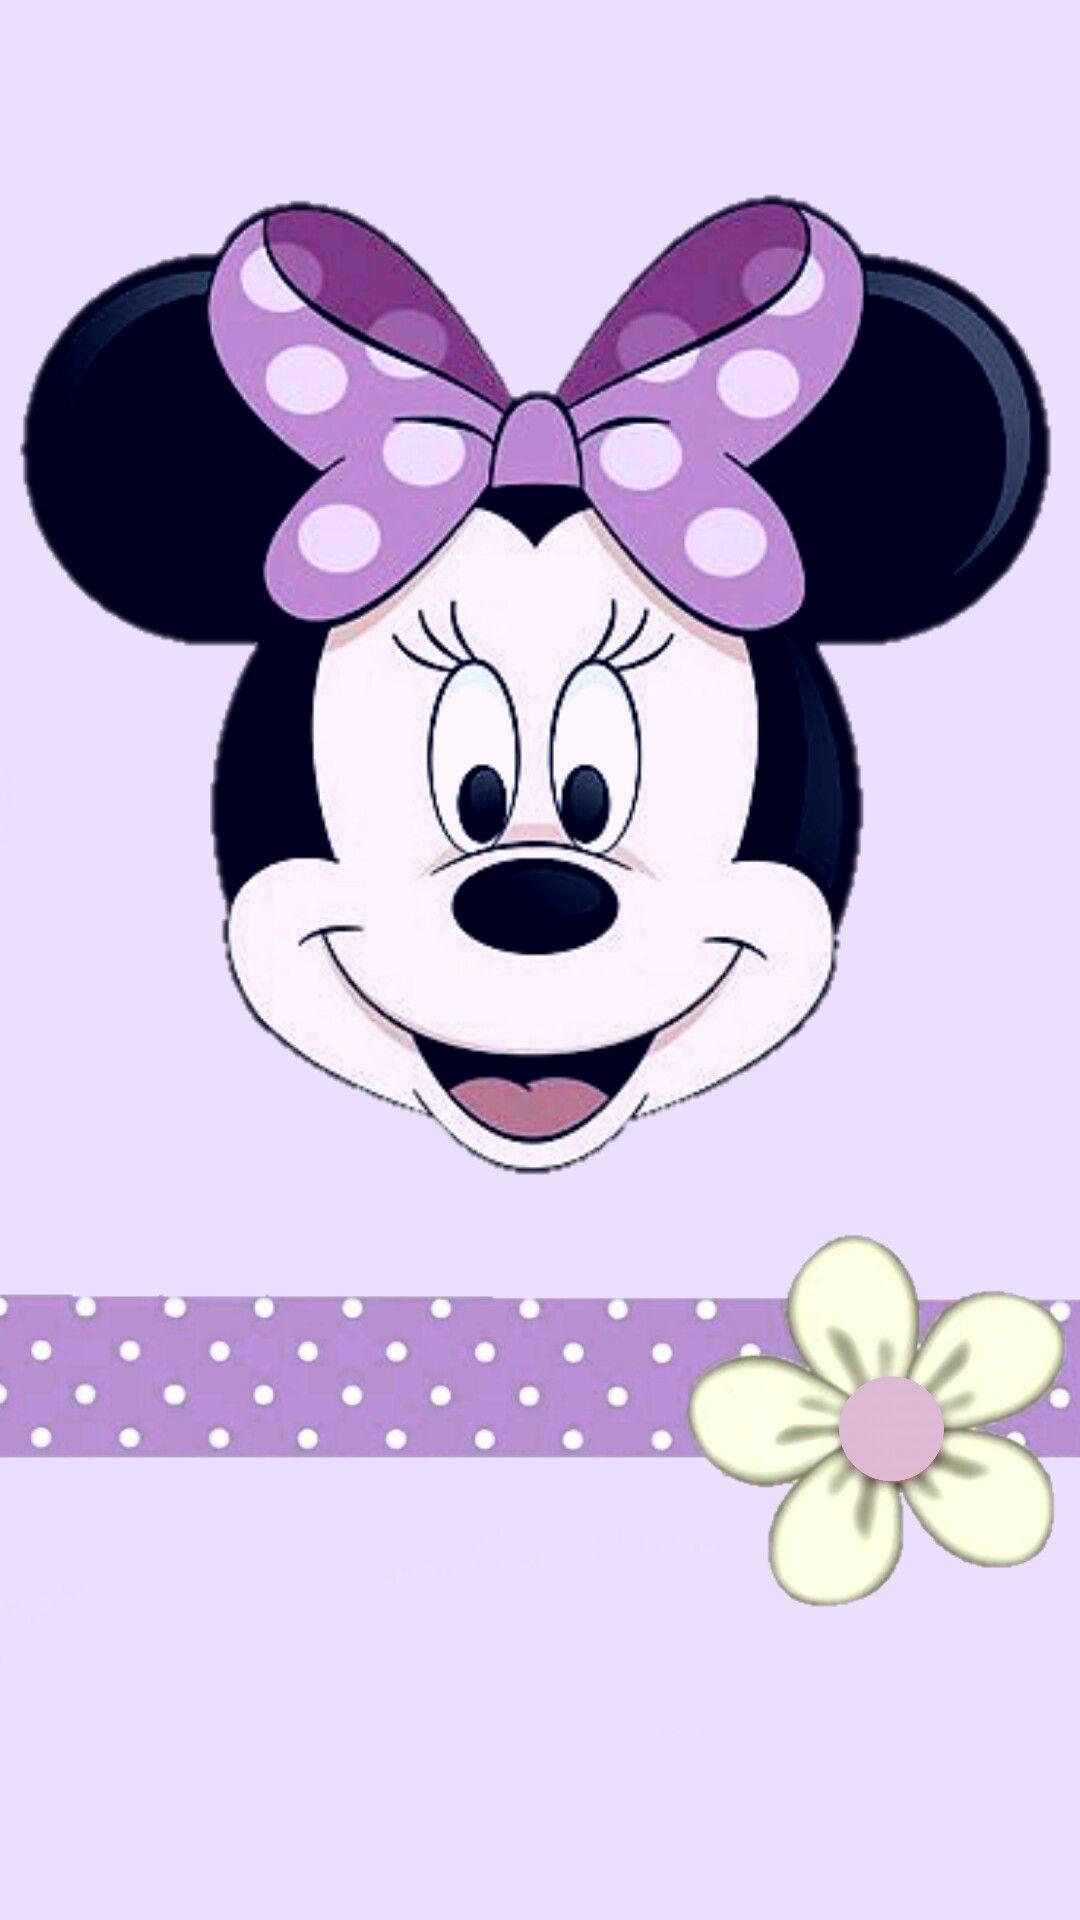 Pin by Pankeawป่านแก้ว on Mickey&minney   Pinterest   Minnie mouse ...